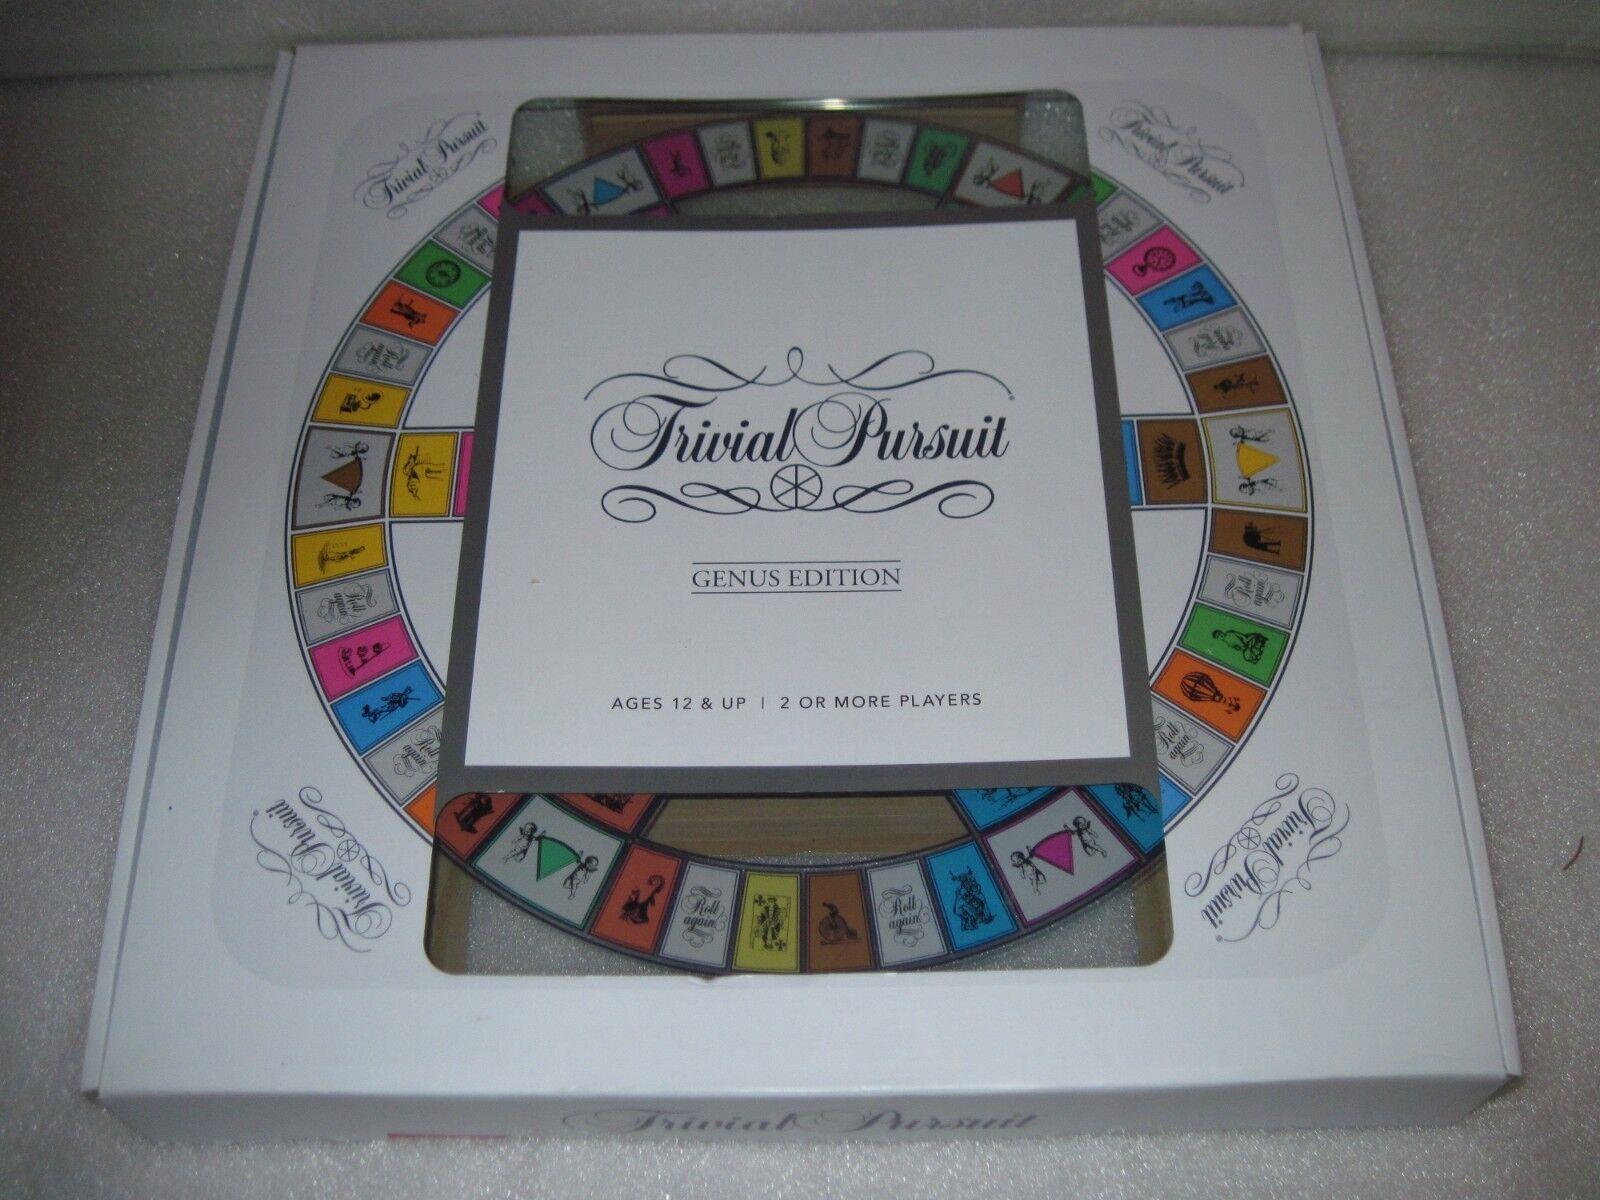 Marque Nouveau TRIVIAL PURSUIT Genus Edition verre trempé Game Board Trading Game